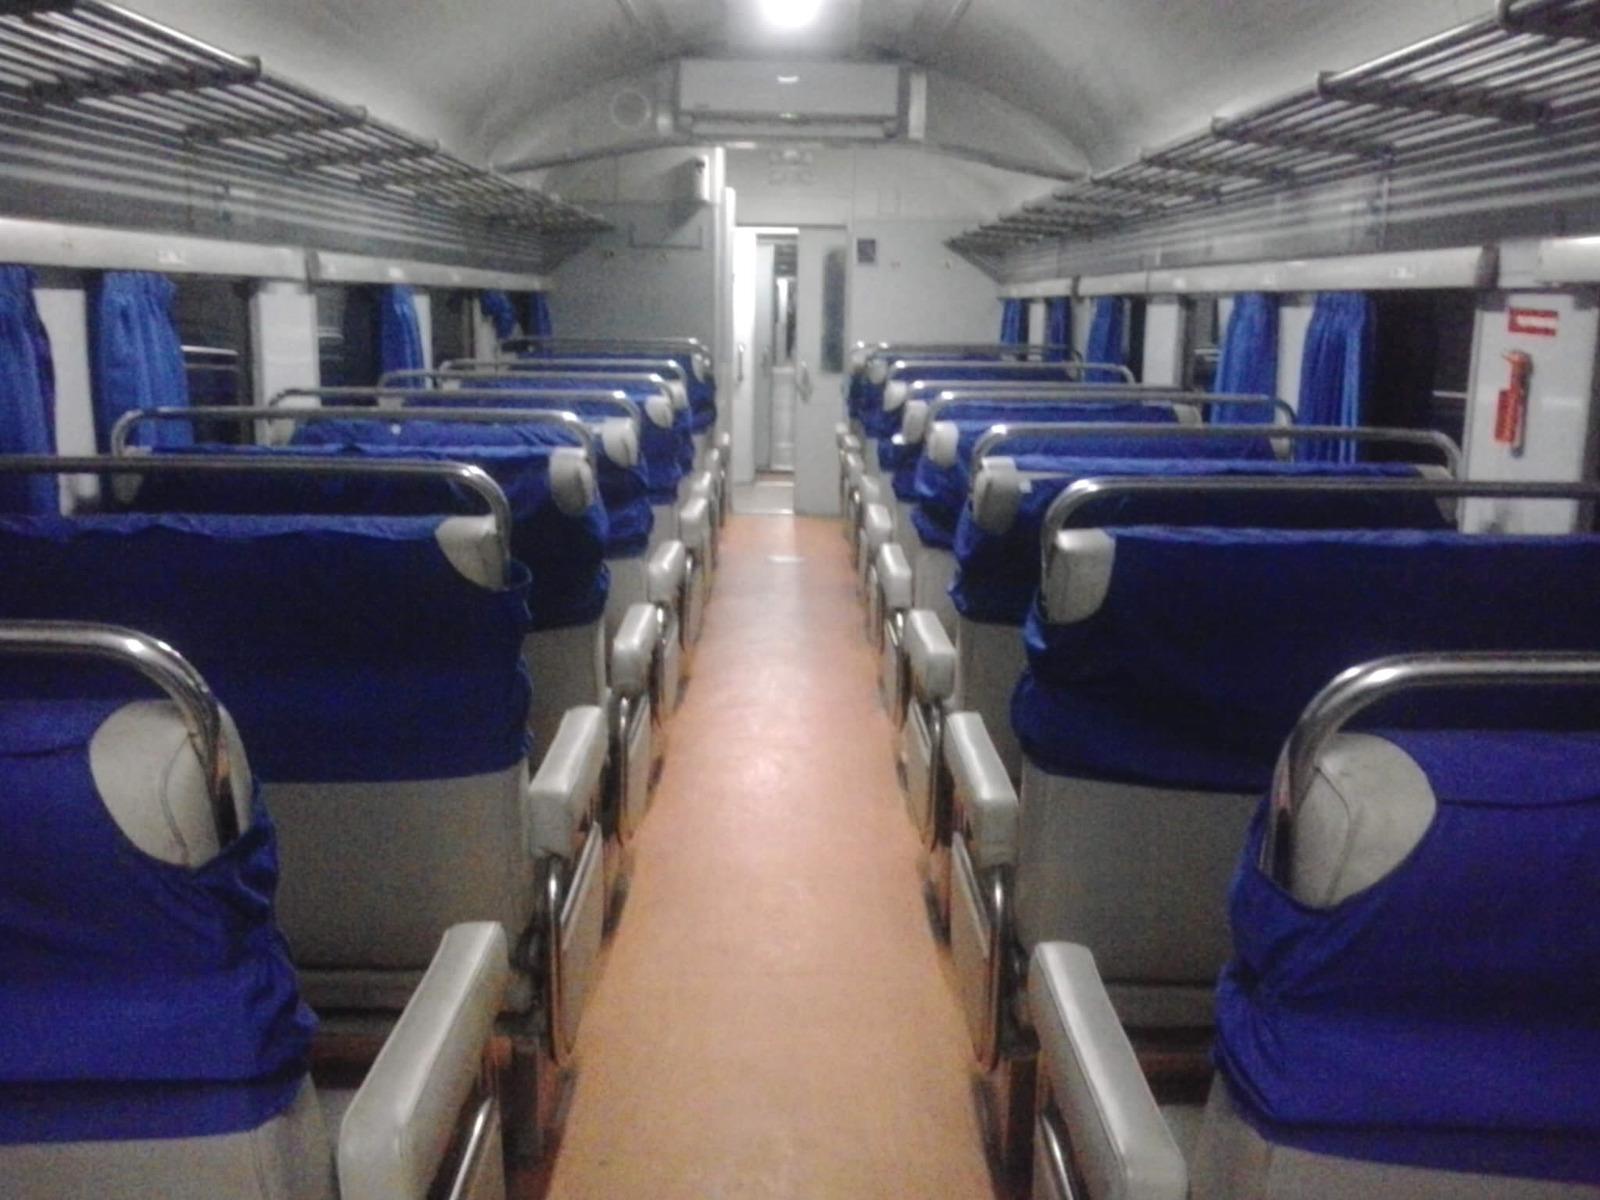 Win Talks Jalan Di Solo Kereta Api Lodaya Ini Kelas Bisnis Ka Malam 81 Masih Sepi Belum Banyak Penumpang Yang Naik Biasanya Akan Penuh Jika Masuk Stasiun Yogyakarta